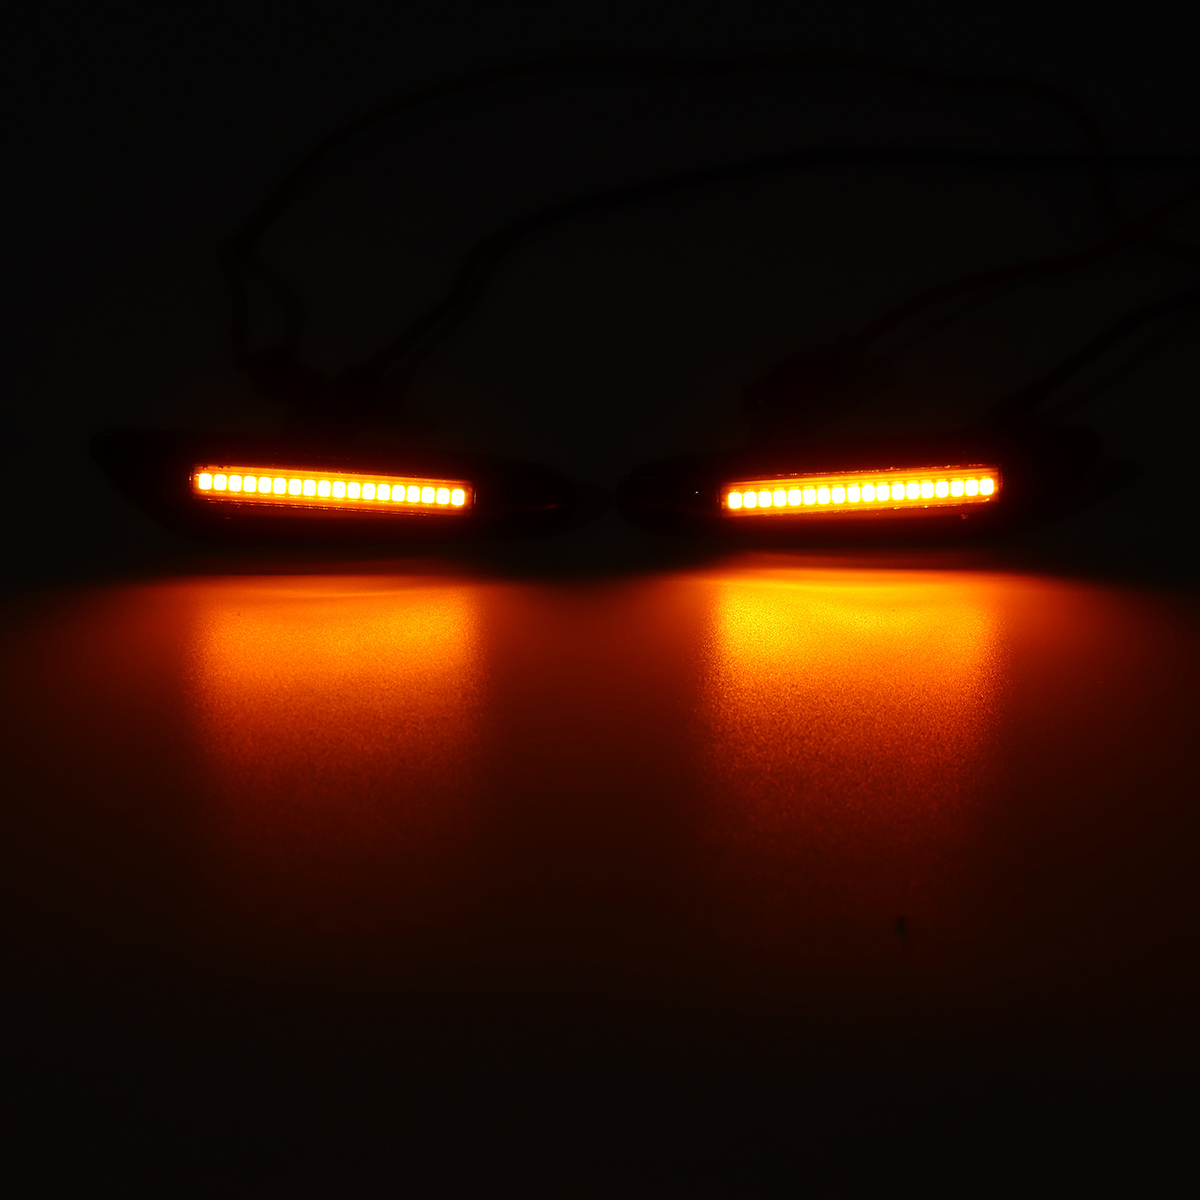 LED Side Marker Lights Repeater Indicator Bulb Pair for BMW E46 E60 E82 E88 E90 E92 E93